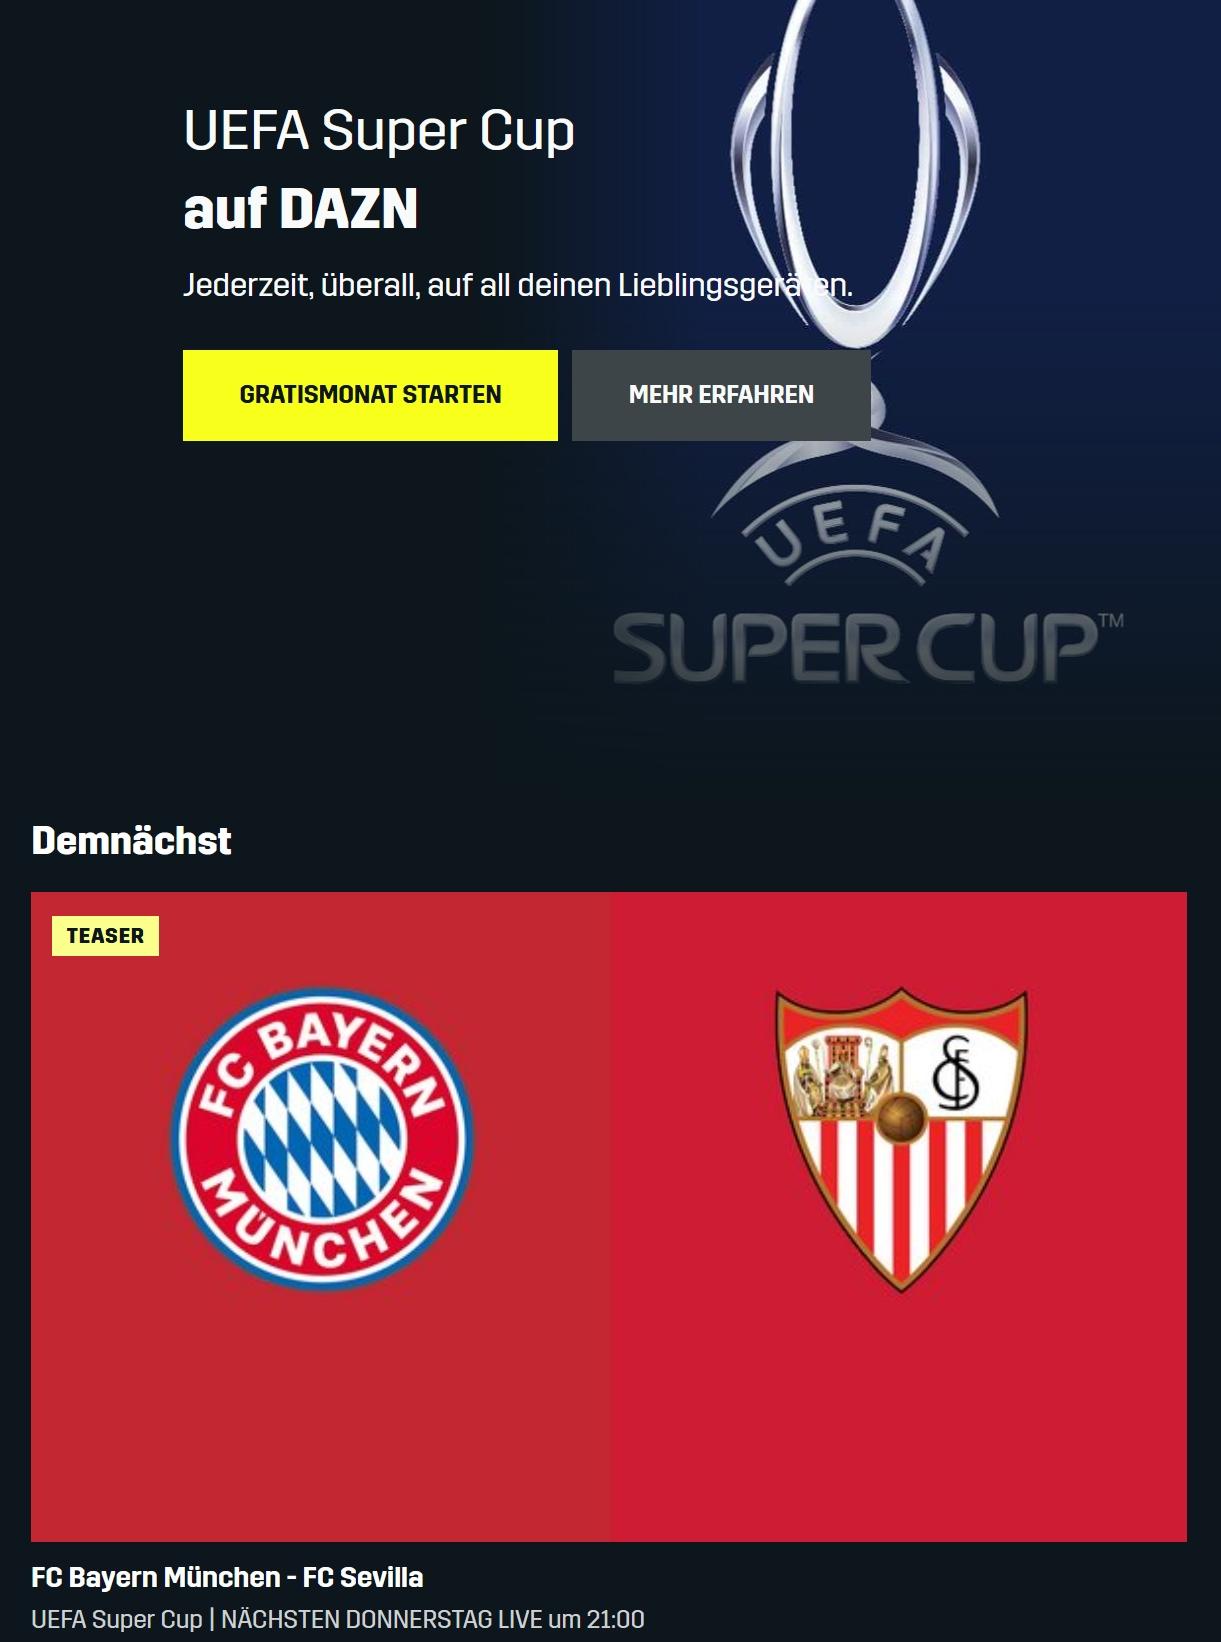 dazn-super-cup-live